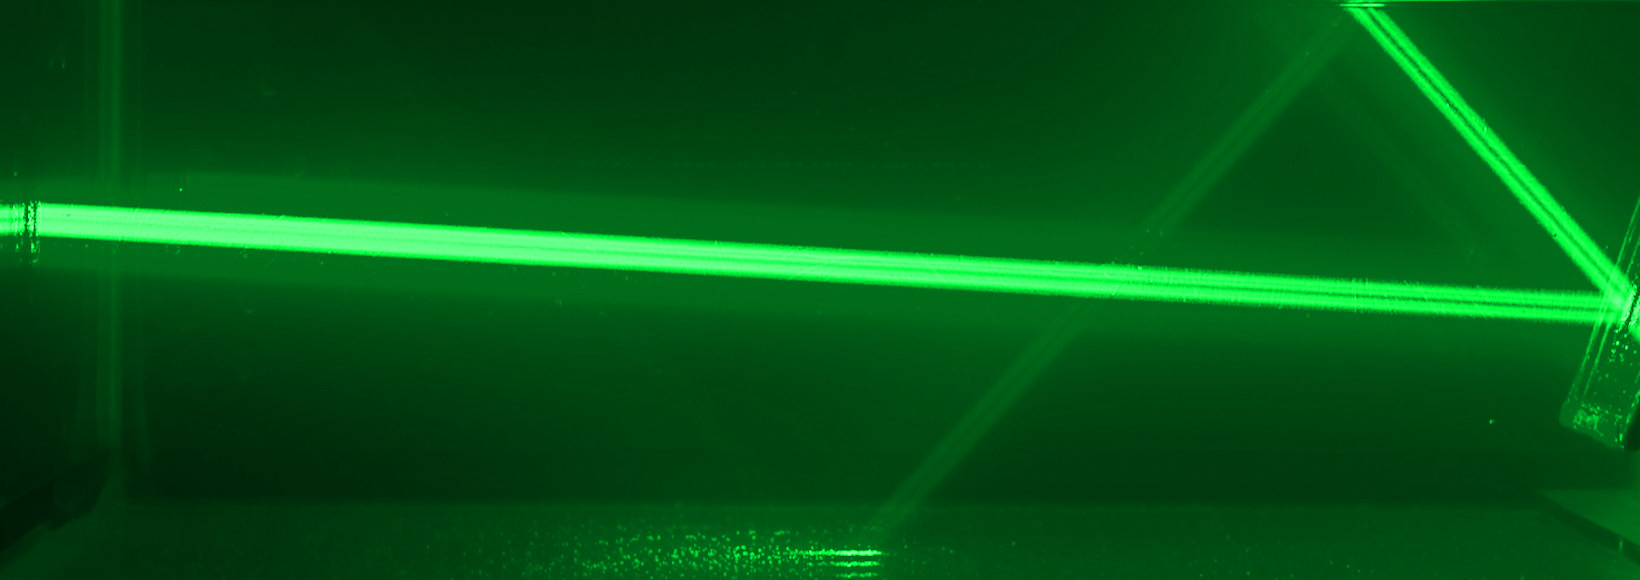 YAG Lasers